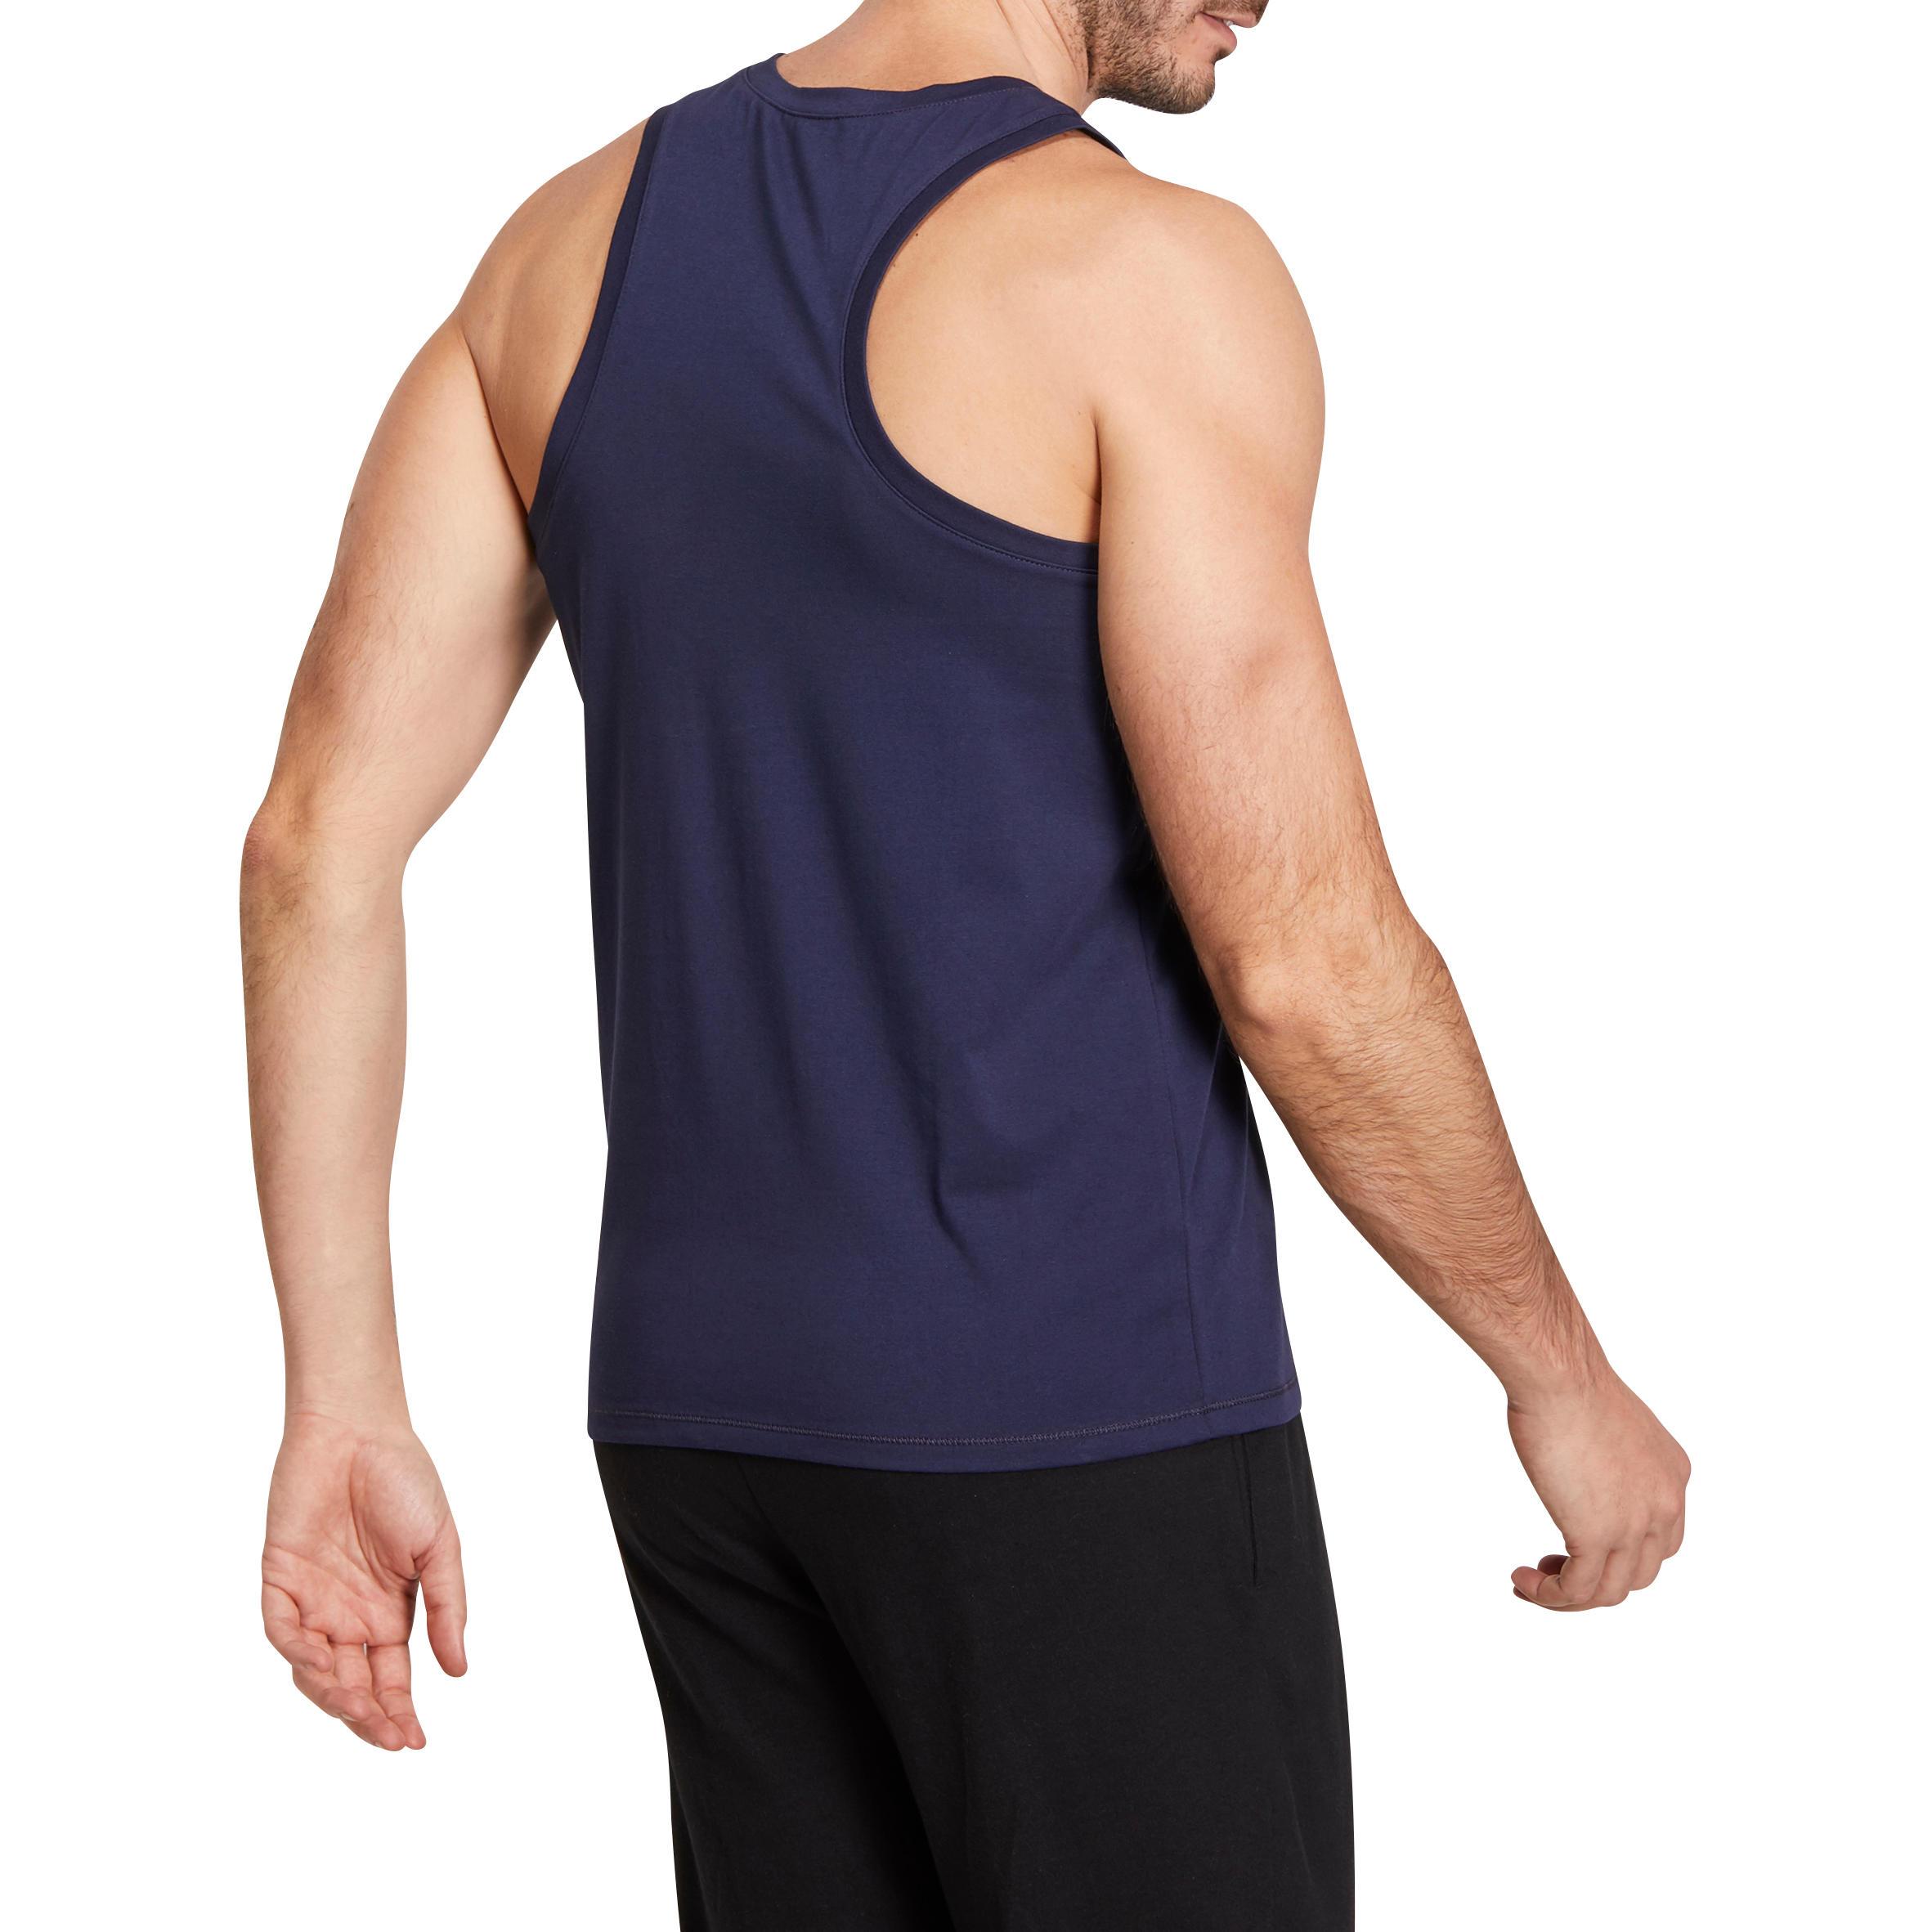 500 Regular-Fit Gentle Gym & Pilates Tank Top - Navy Blue